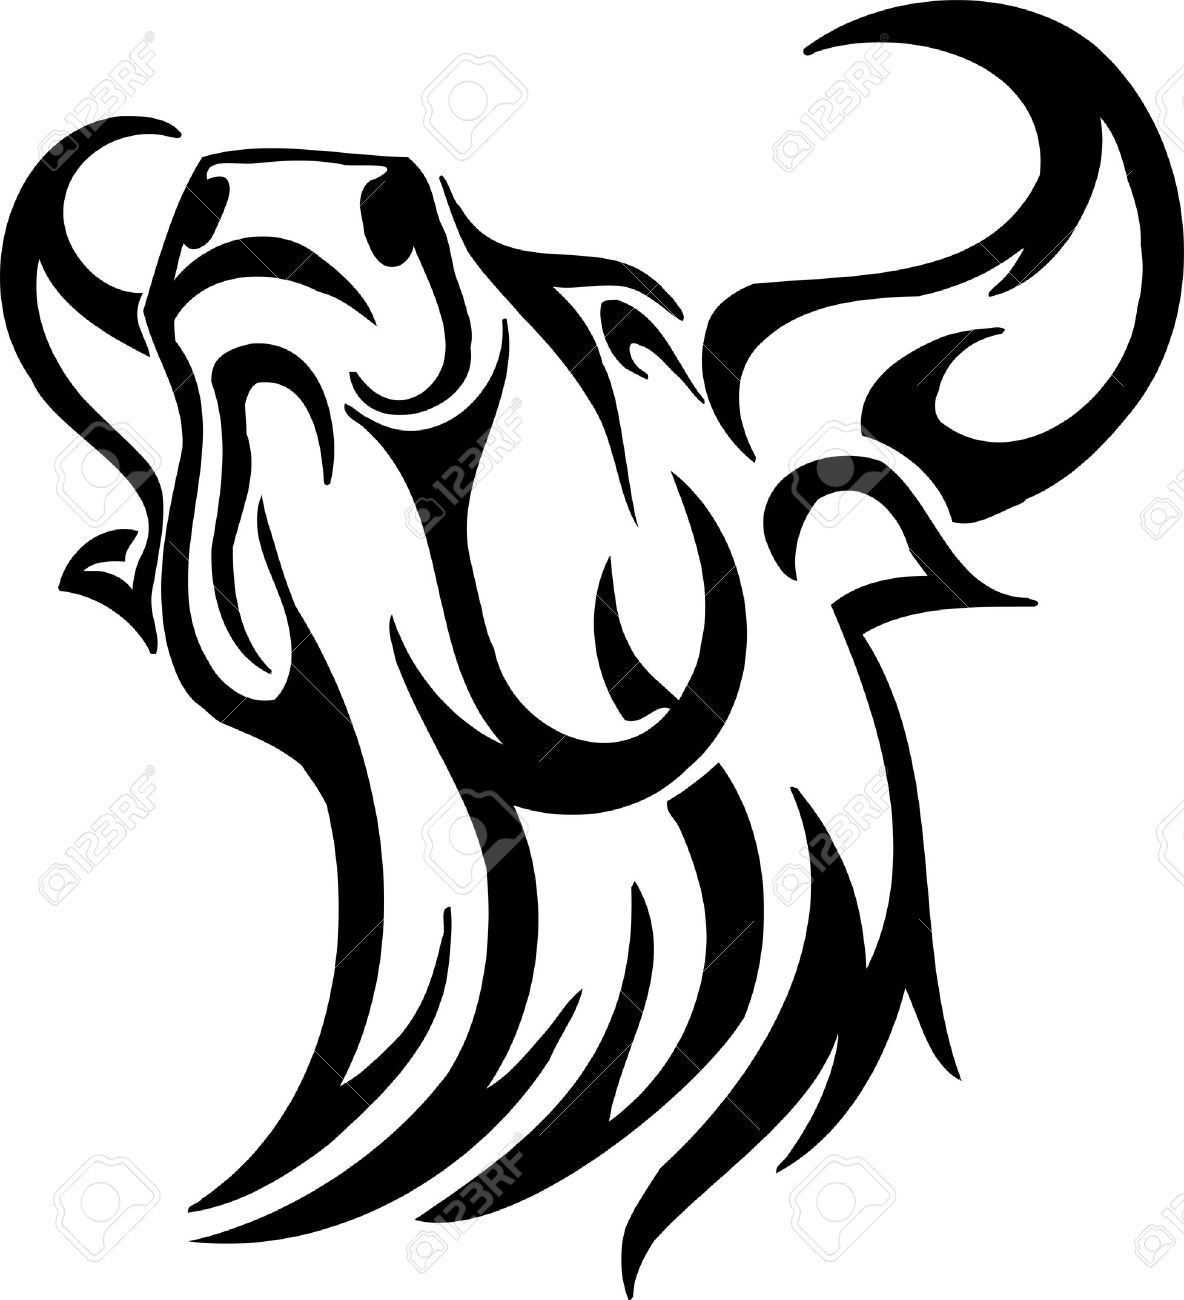 Bull in tribal style - vector image. Stock Vector - 12490547